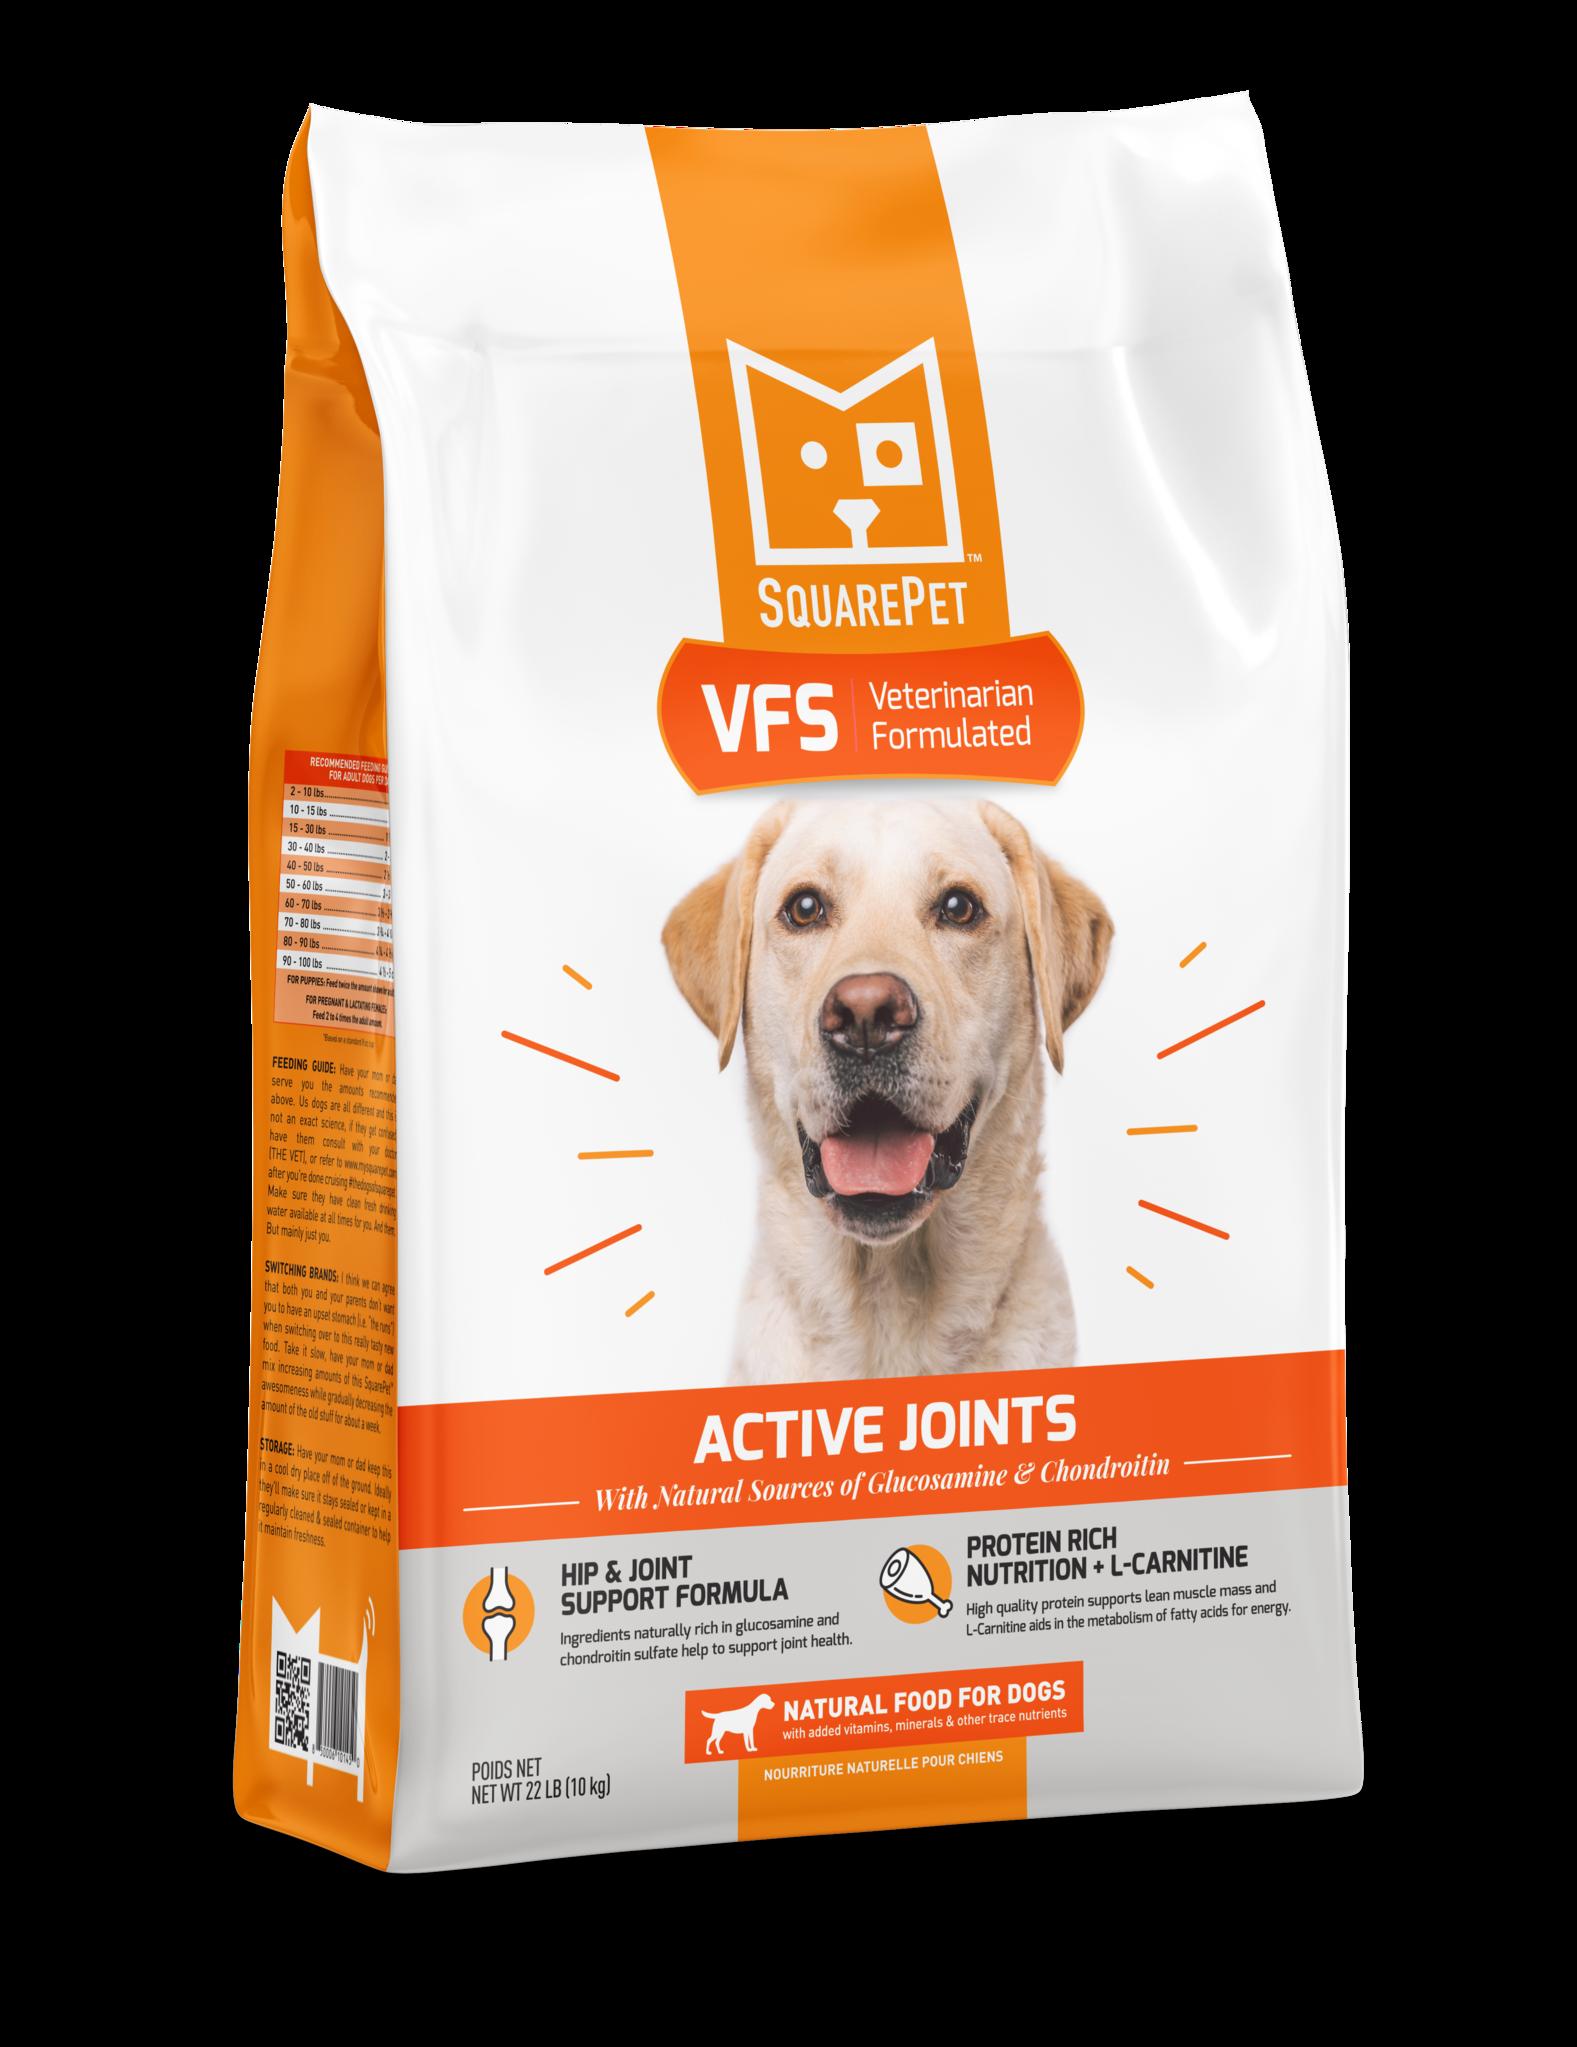 SquarePet VFS Active Joints Dry Dog Food, 4.4-lb